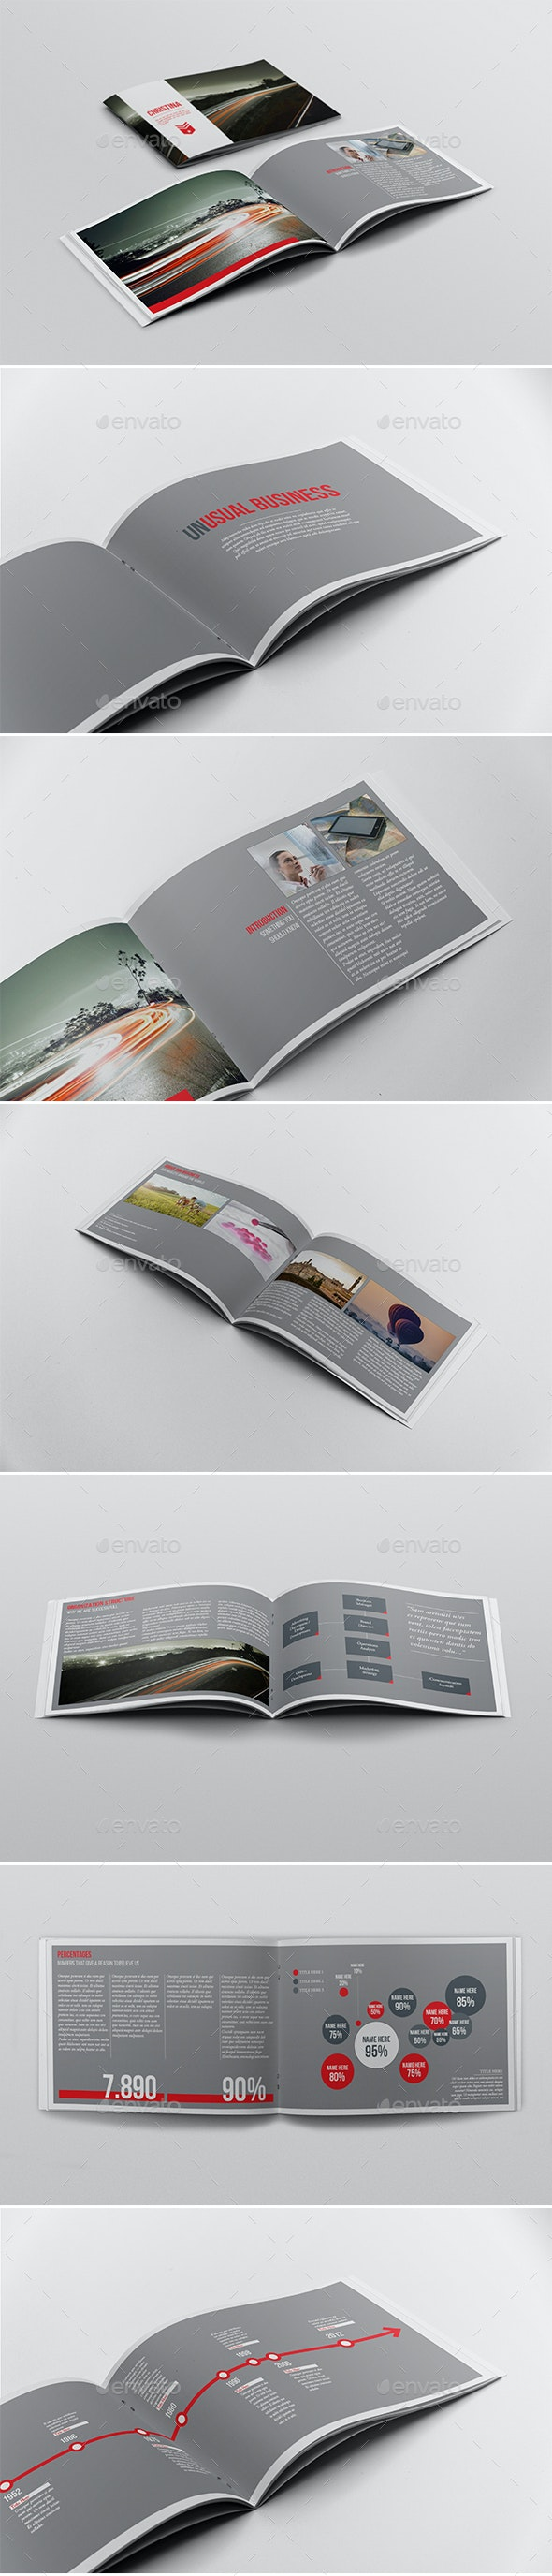 Business Report Brochure Template - Brochures Print Templates